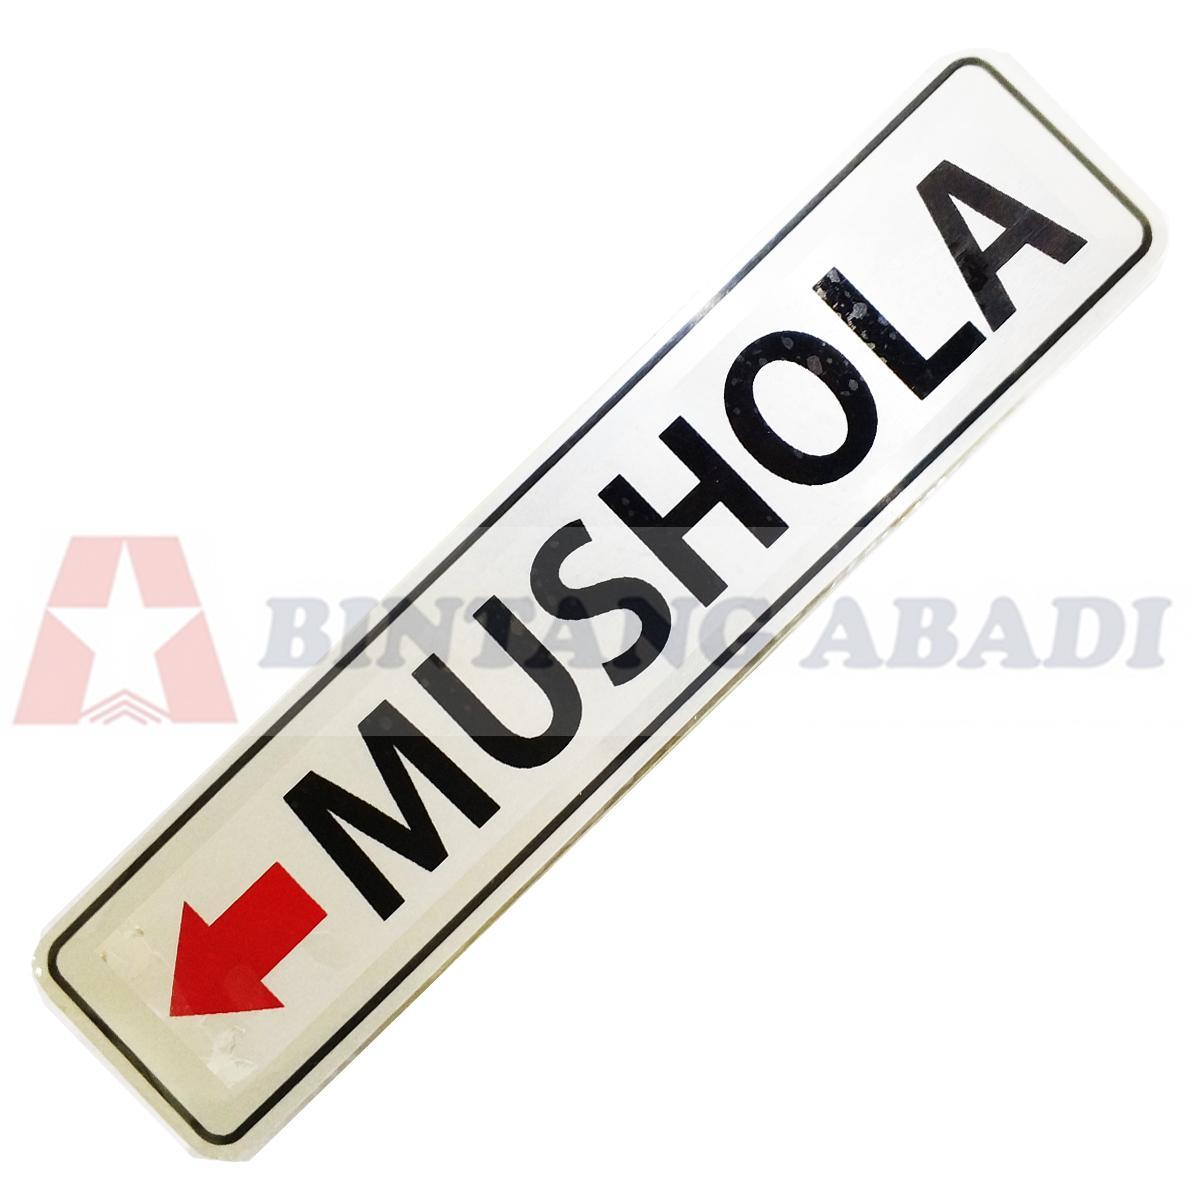 Daftar Harga Karpet Mushola Murah 2018 Cari Banding Disini Sandal Wudhu Masjid Kantor Hotel Termurah Star Hardware Stiker Sign Petunjuk St02 Ke Kiri 21 X 5 Cm